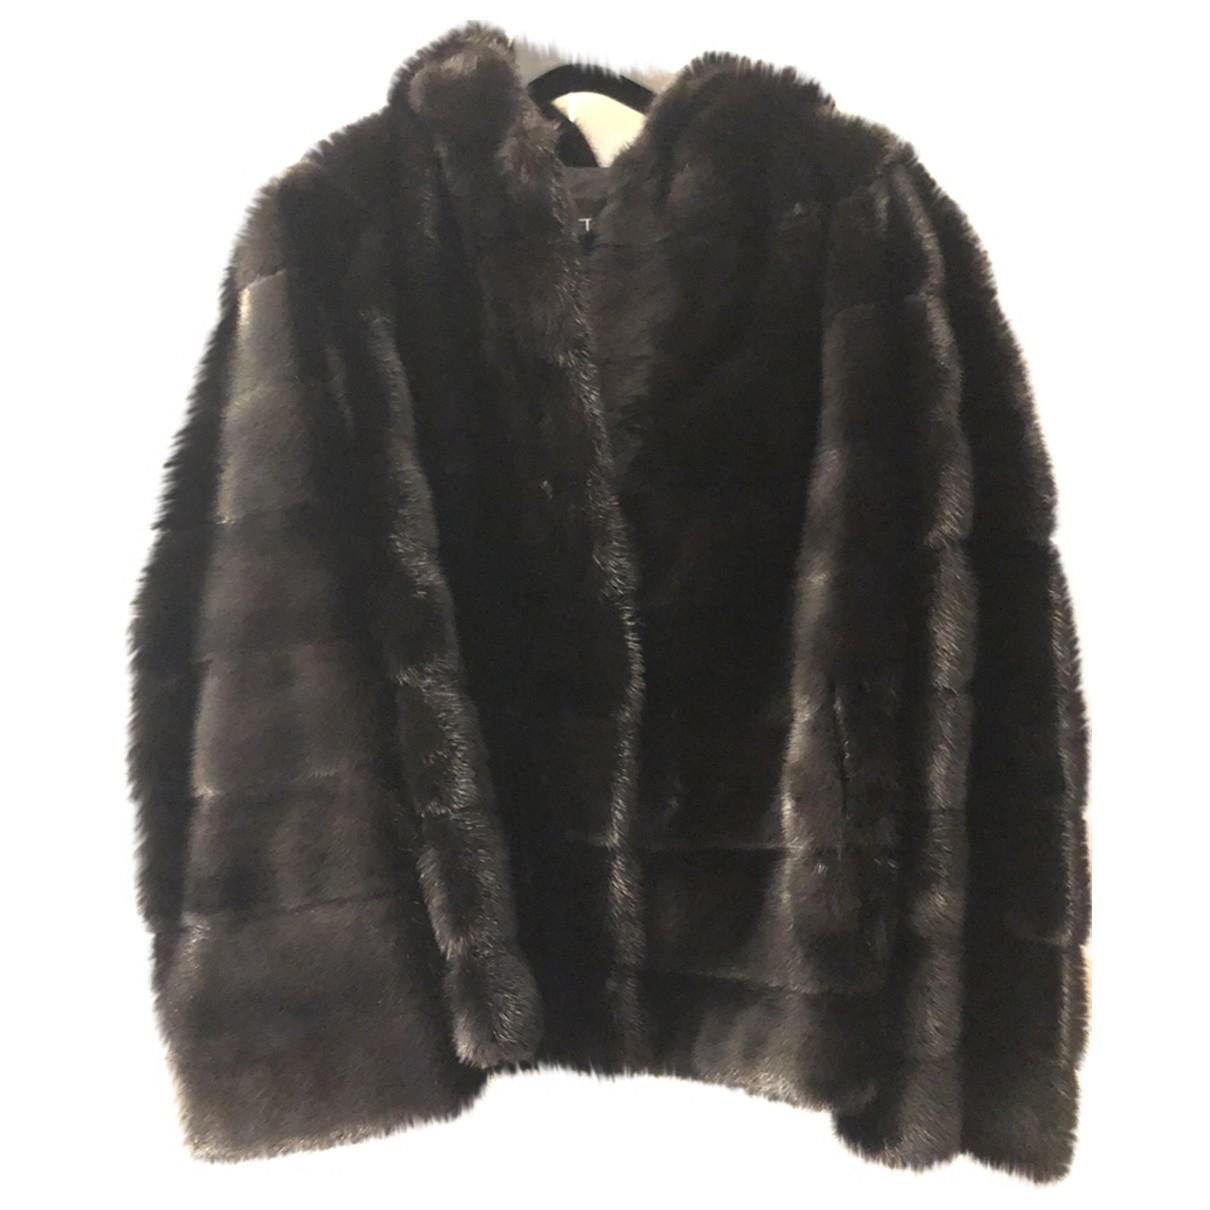 Giuliana Teso - Manteau   pour femme en vison - noir